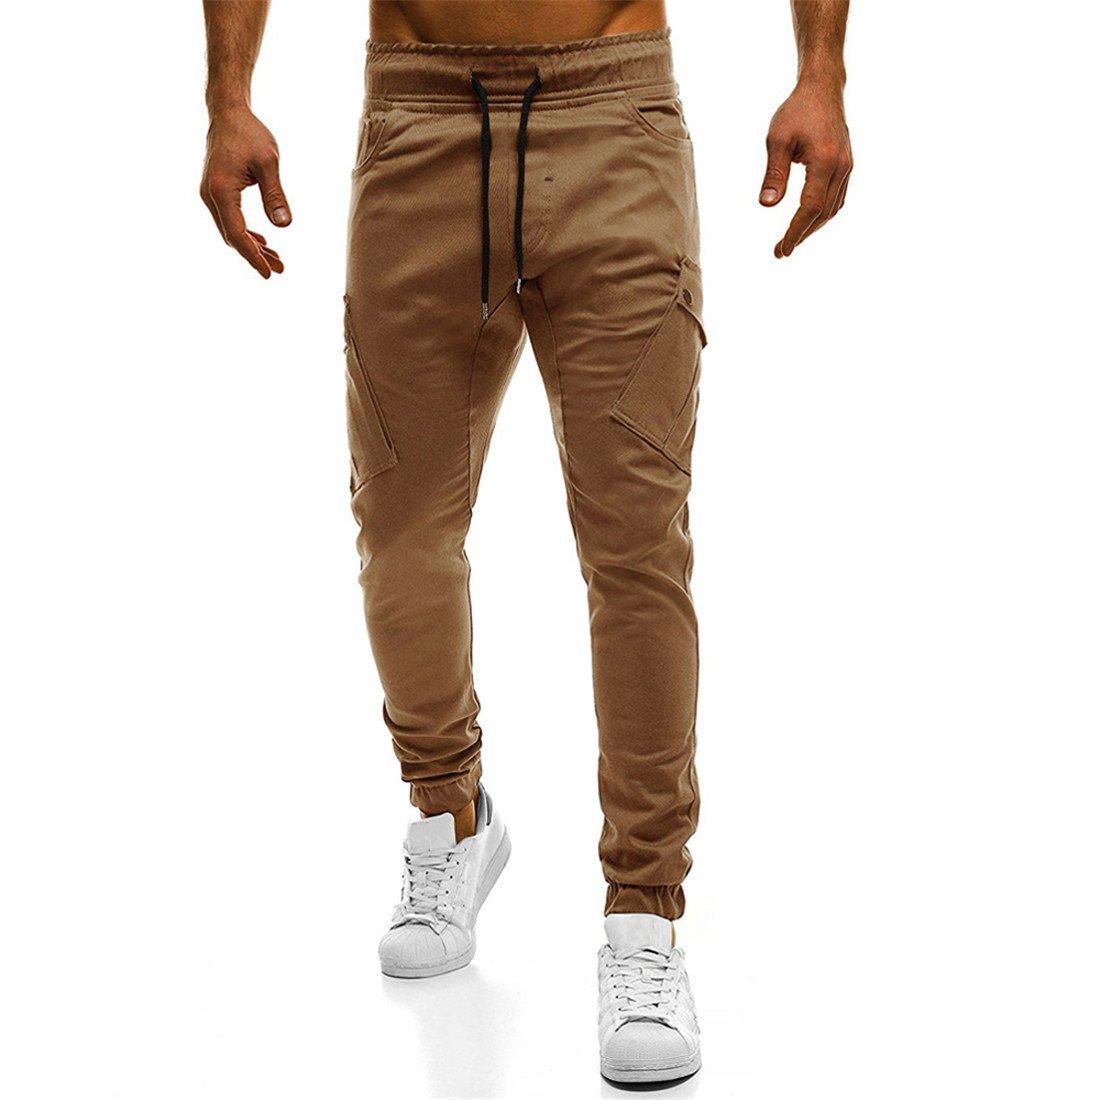 GRMO-Men Elastic Waist Running Solid Color Sport Multi-Pockets Jogger Pants